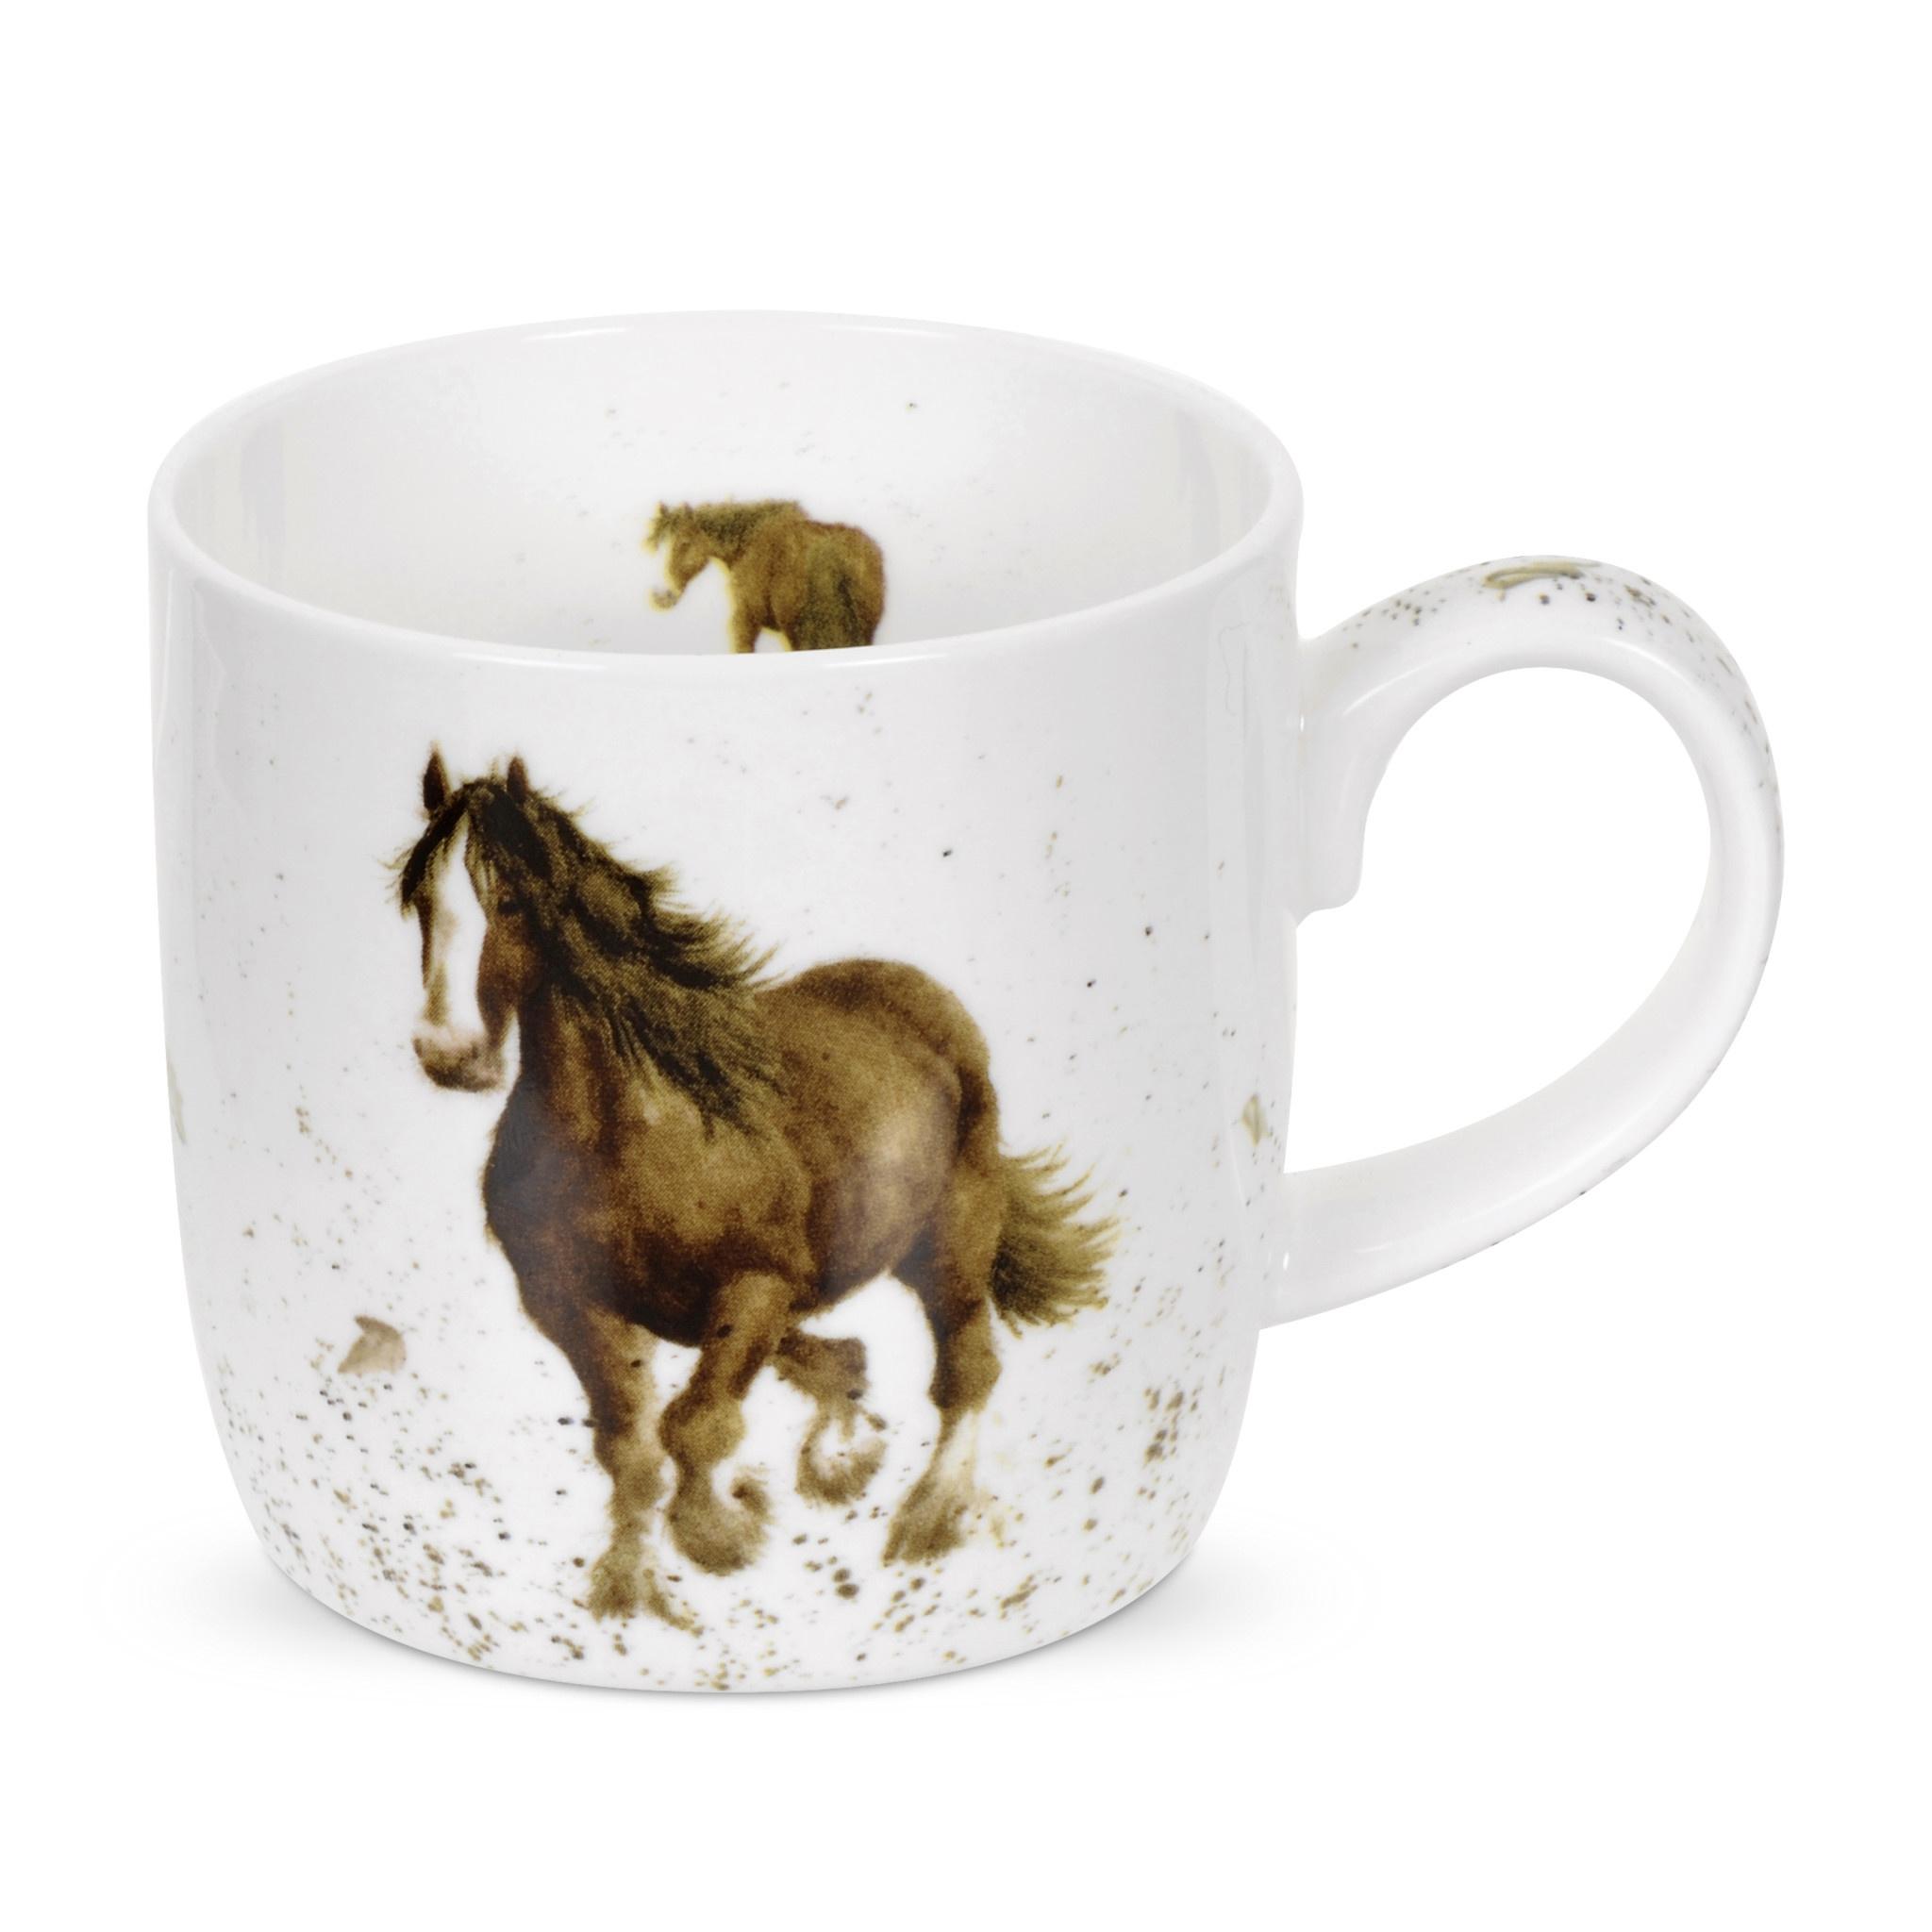 Wrendale Designs 'Gigi' (Horse) Mug